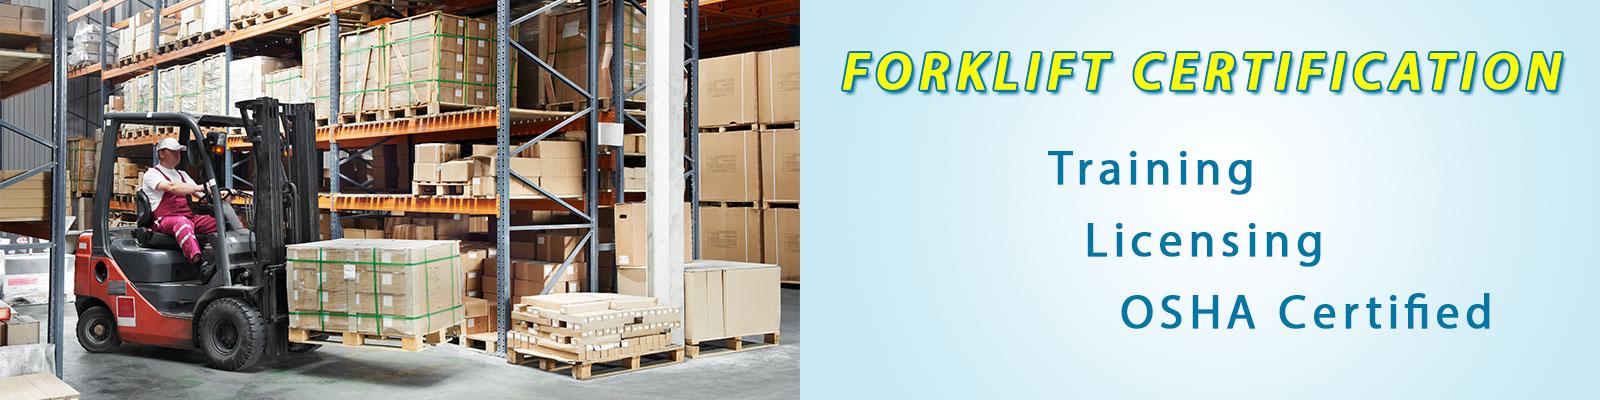 Forklift certification special